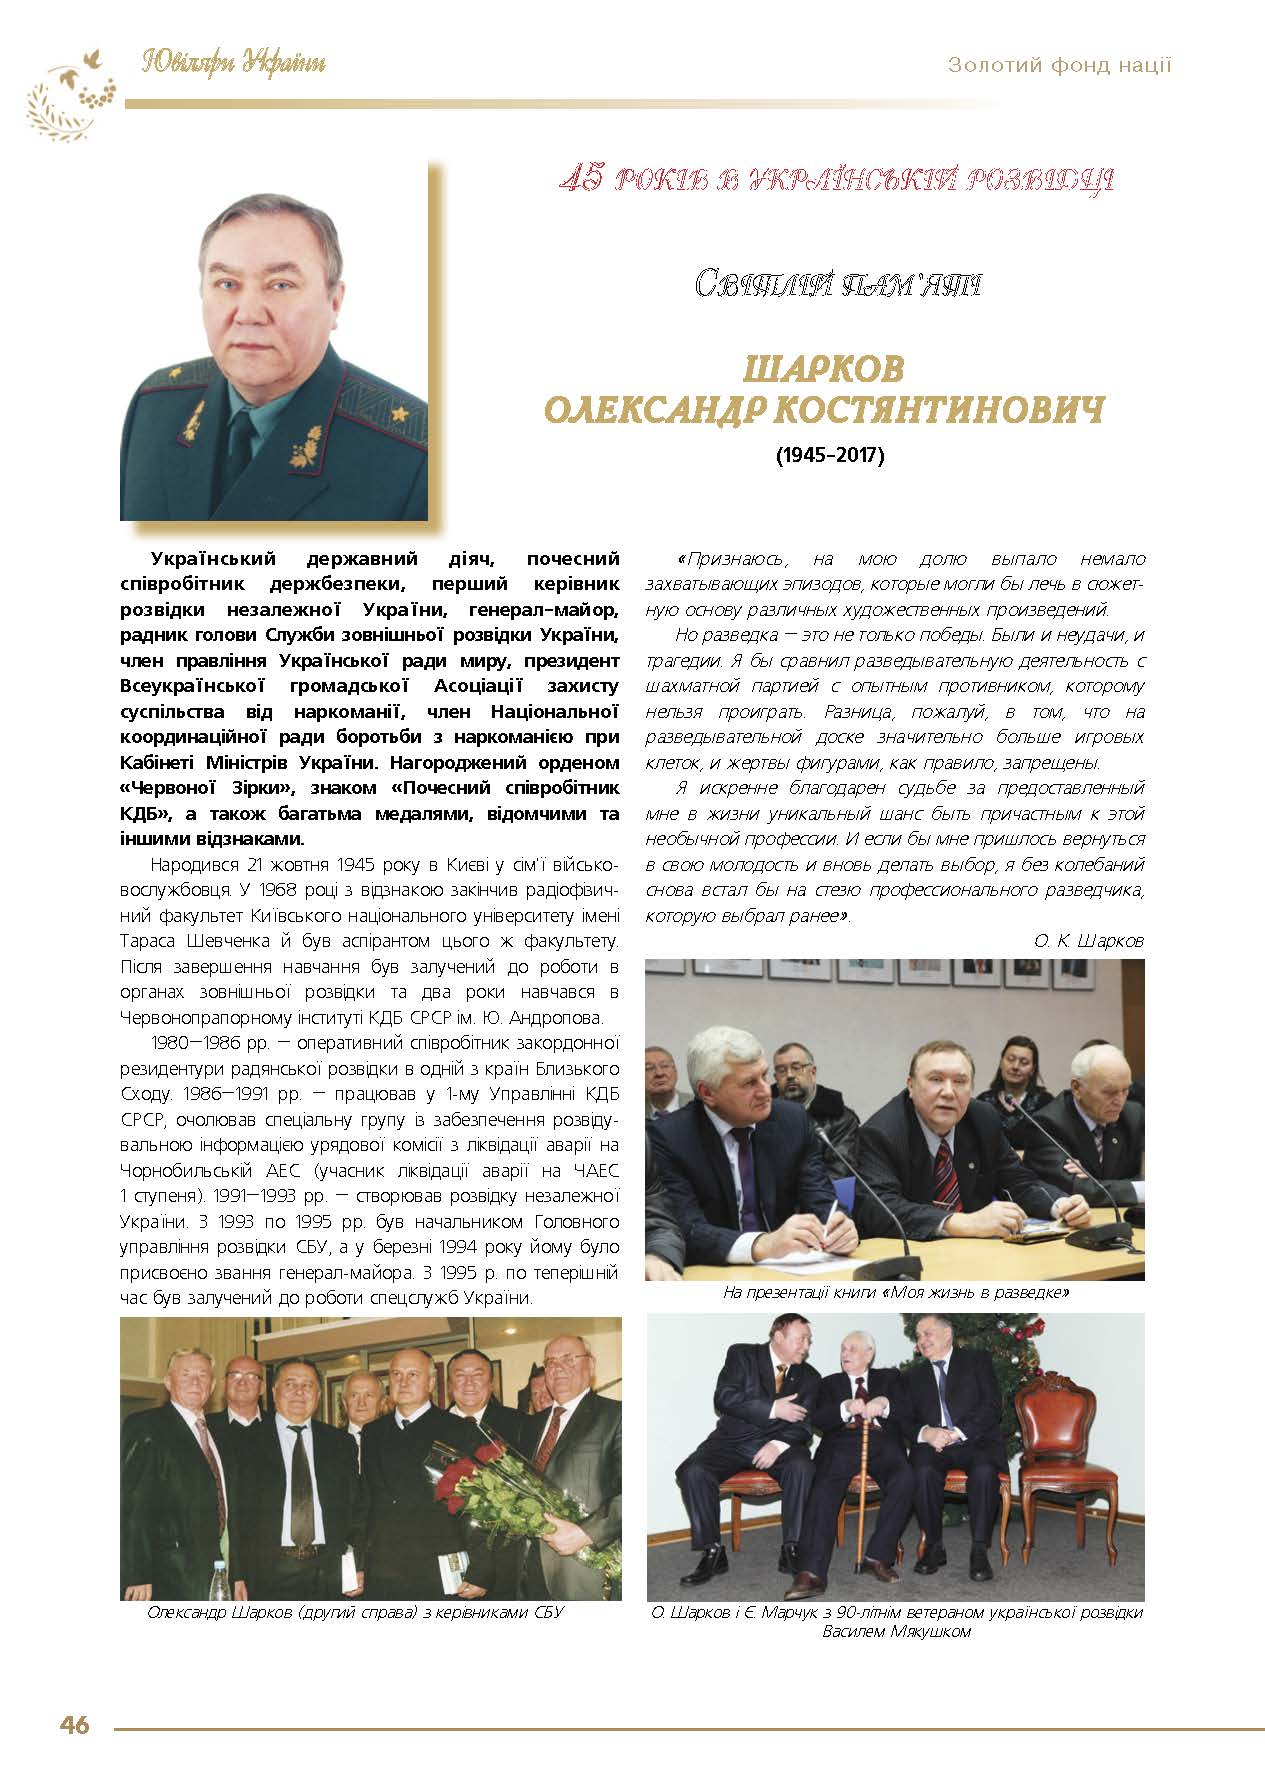 Шарков Олександр Костянтинович